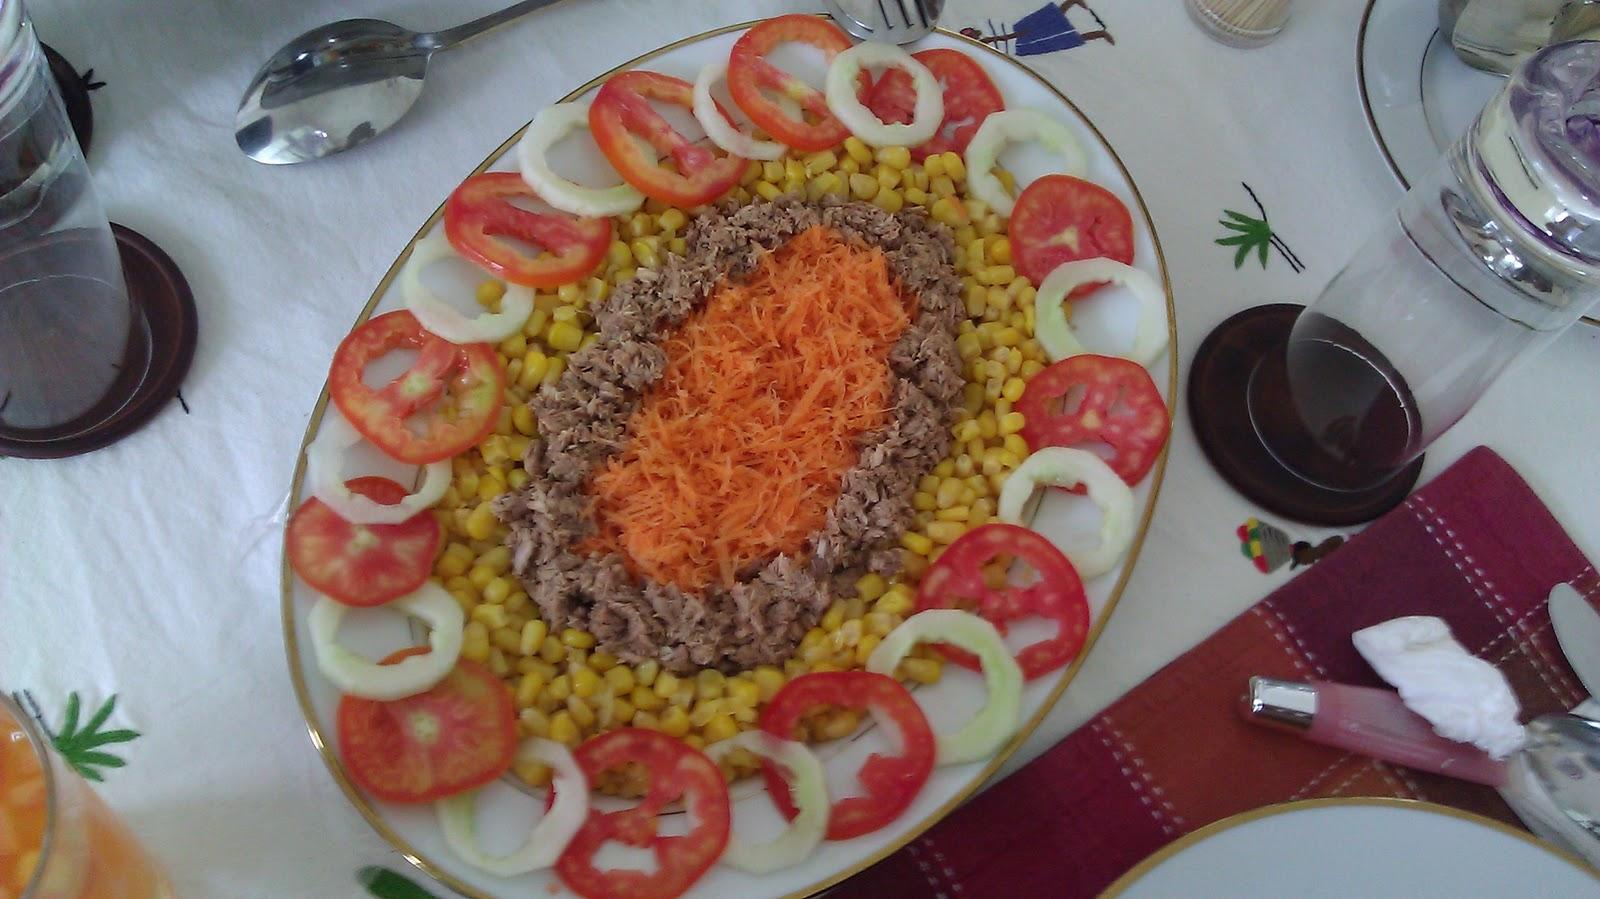 ... Ivorian Food Diary: Abidjan, Ivory Coast (Cote d'Ivoire), West Africa